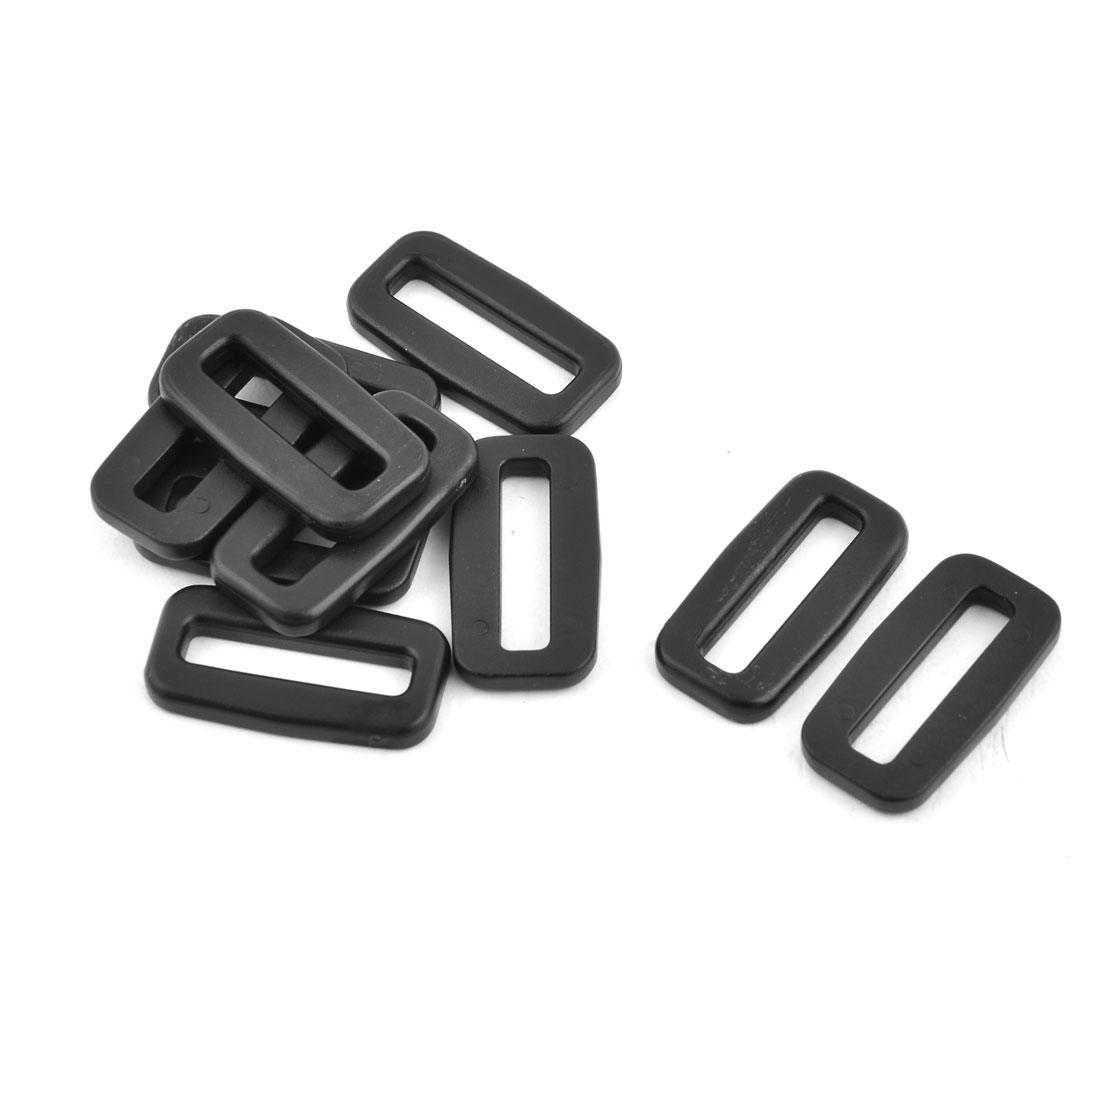 Plastic Adjustable Lock Connect Tri Glide Buckles Black 25mm Strap Width 10 Pcs